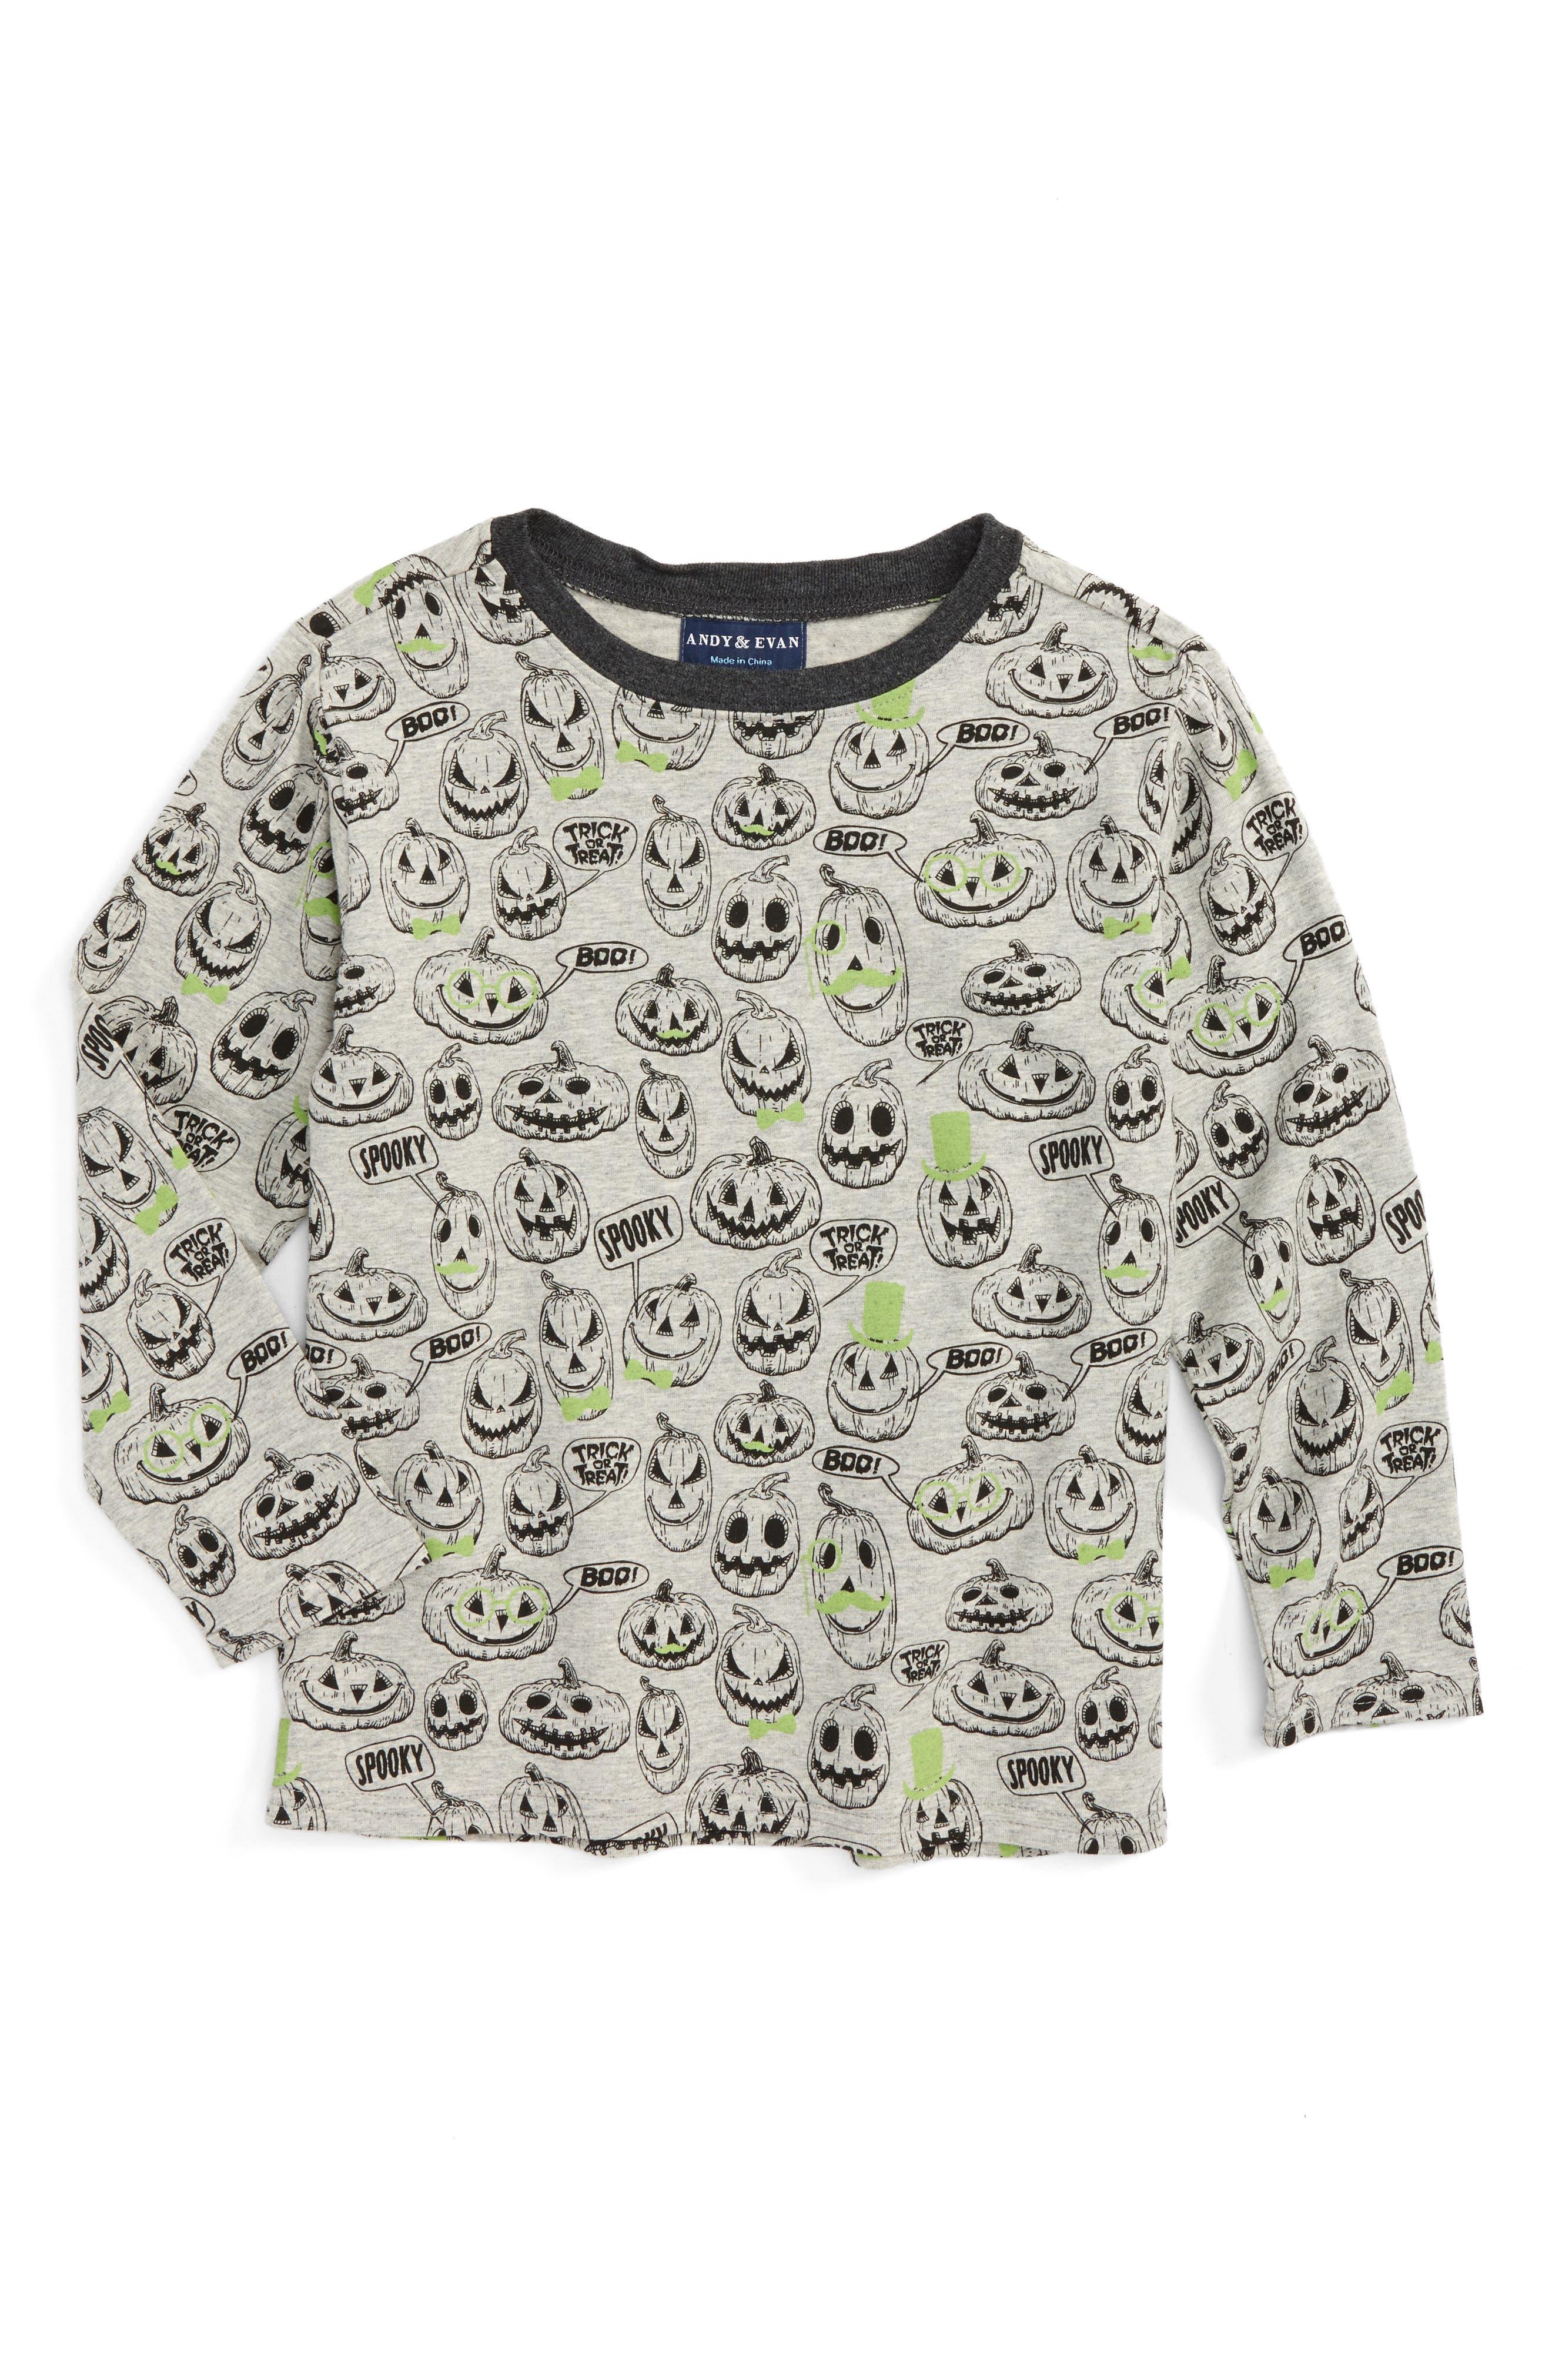 Andy & Evan Jack-O'-Lantern T-Shirt (Toddler Boys & Little Boys)